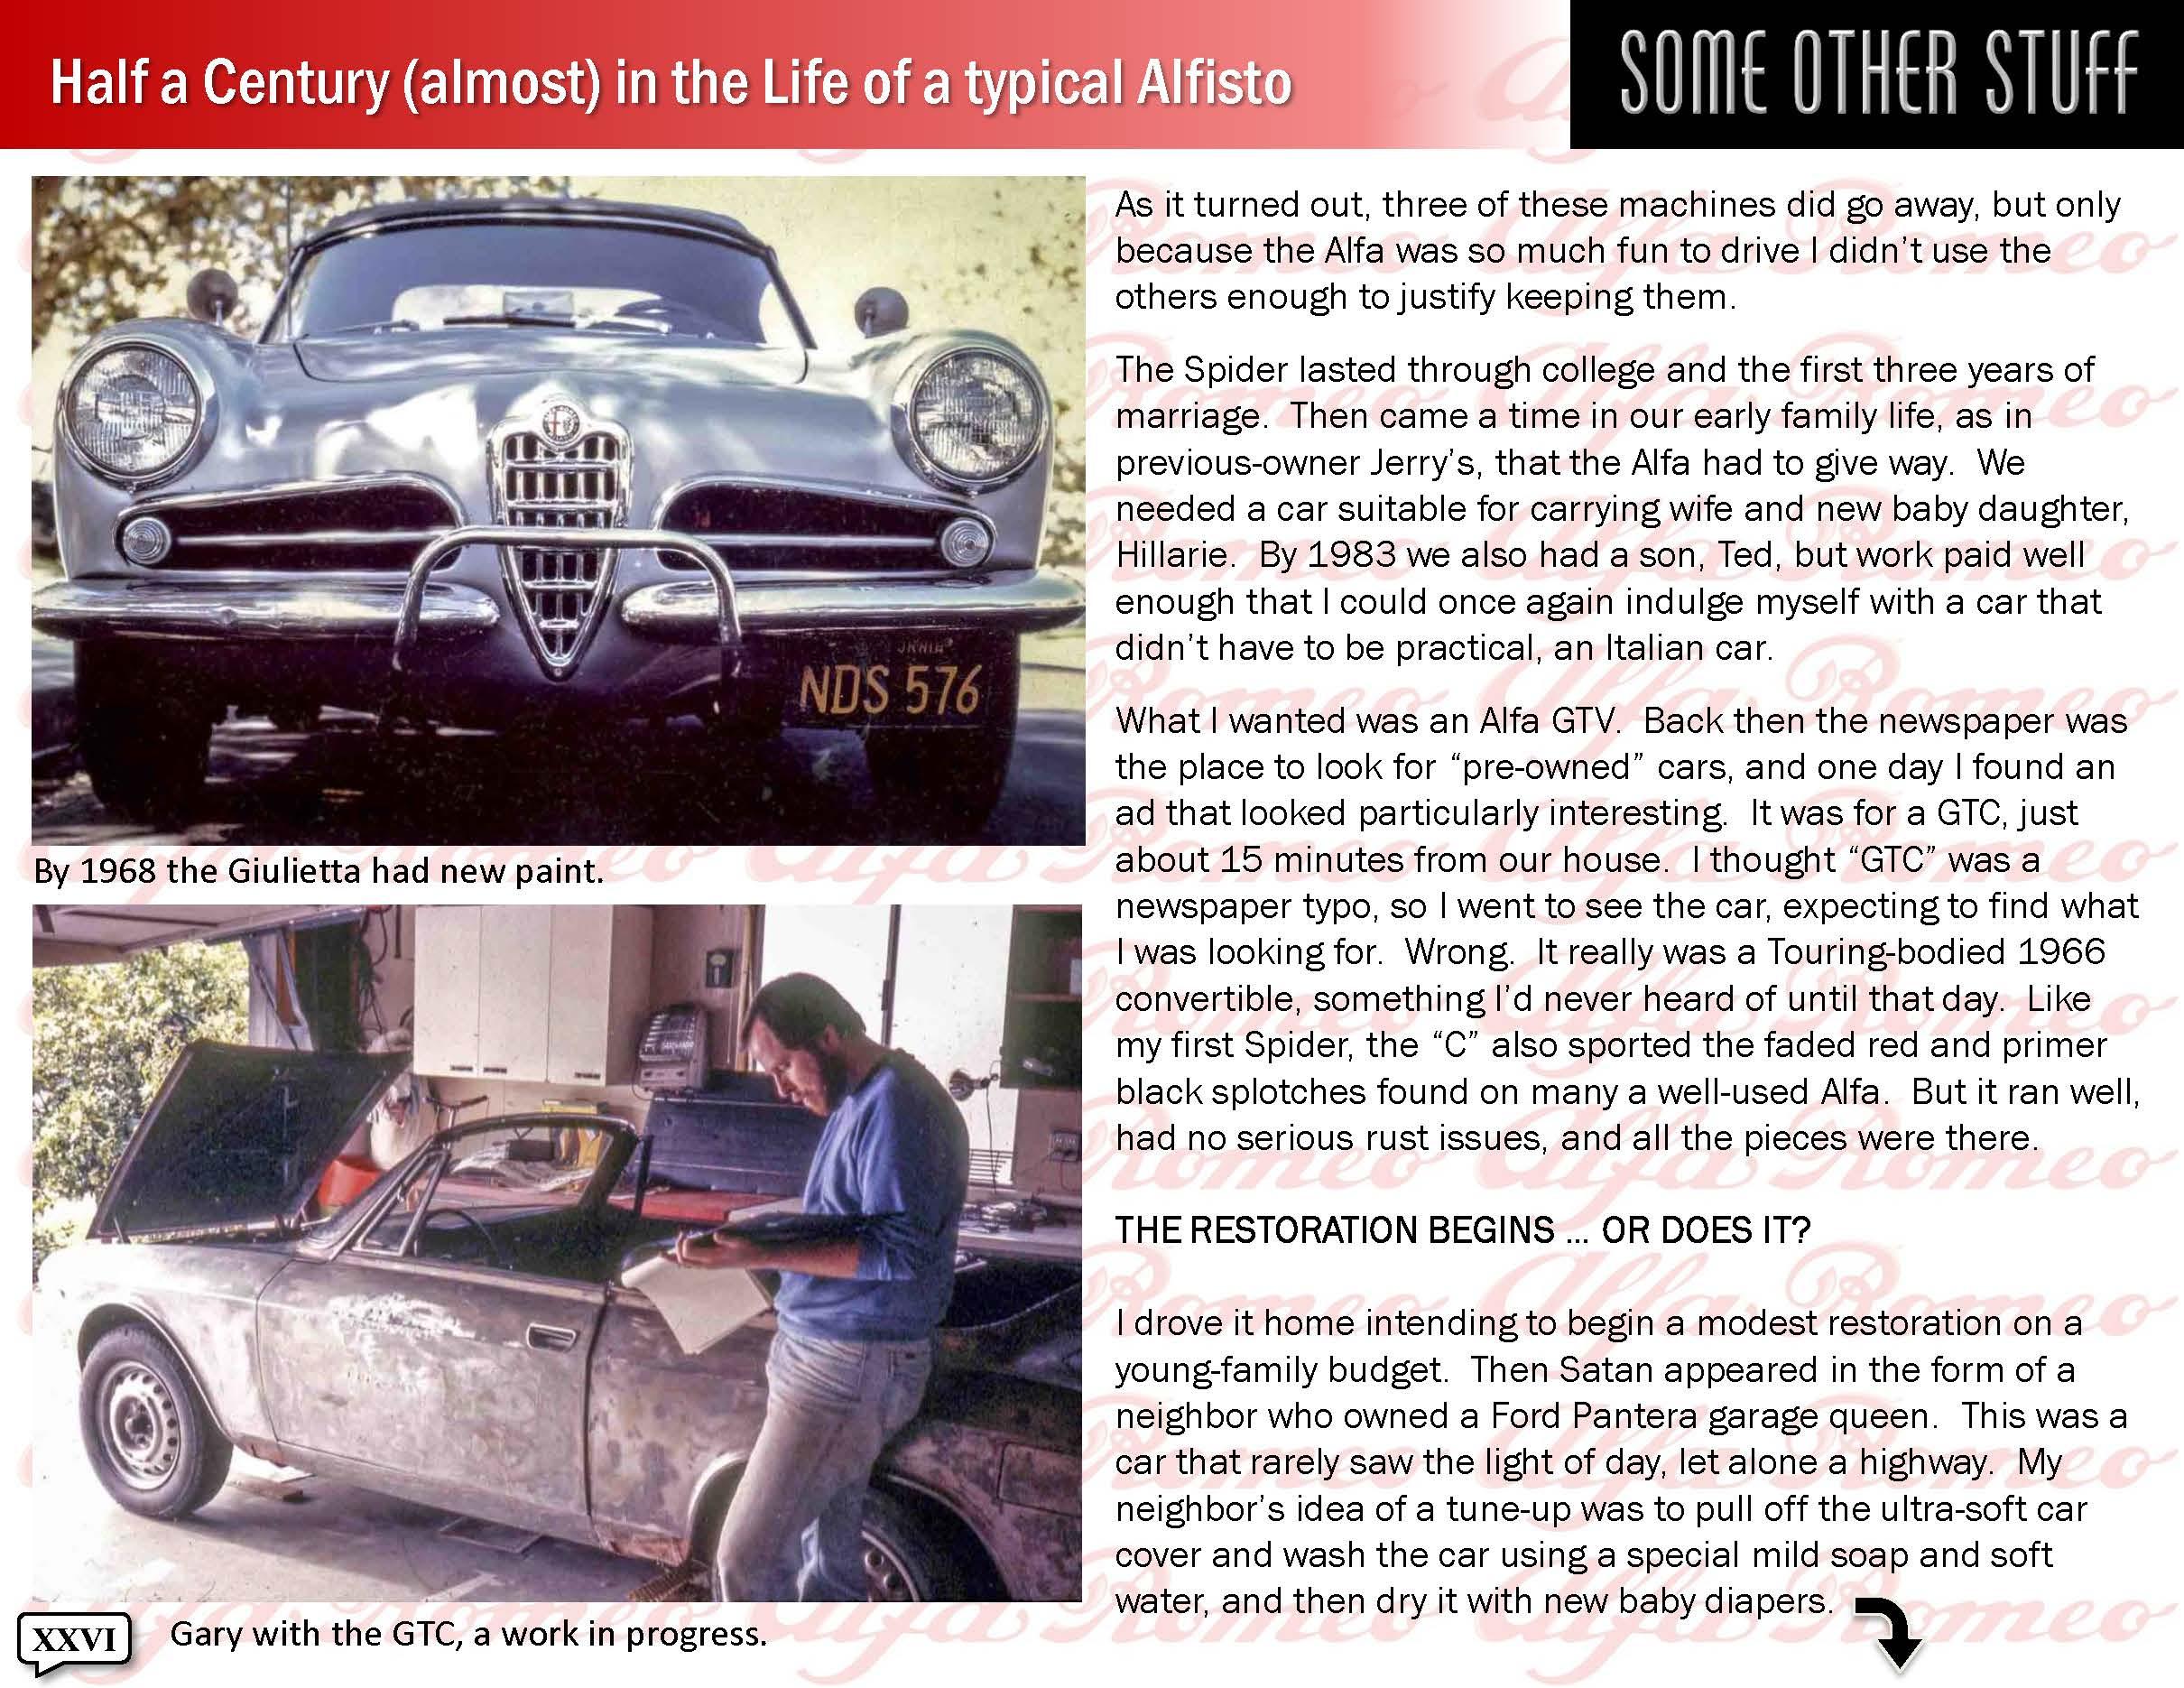 www.alfaclub.org_Newsletters_files_ALFA BITS 2014 02_Page_26